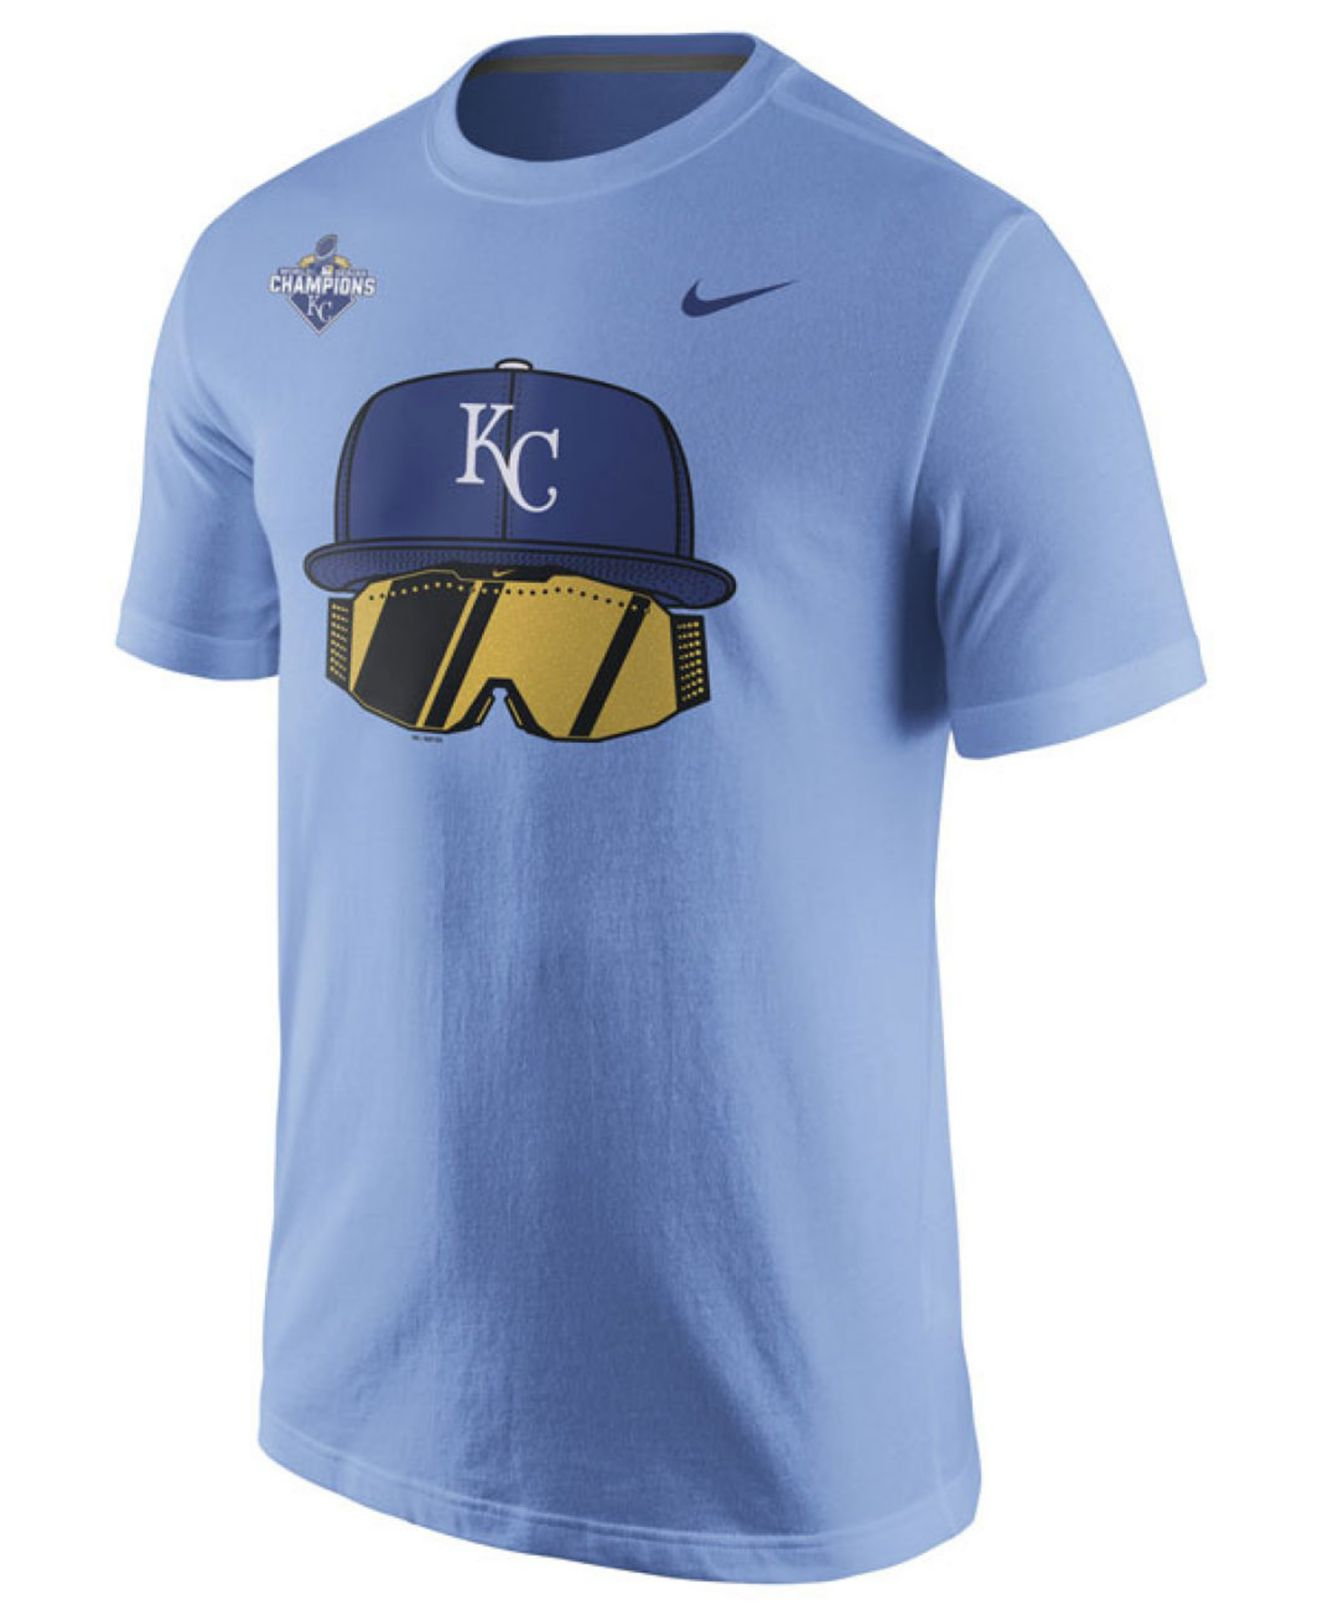 the best attitude 5560d 51361 Nike Men s Kansas City Royals Celebration Goggles T-shirt in Blue ...